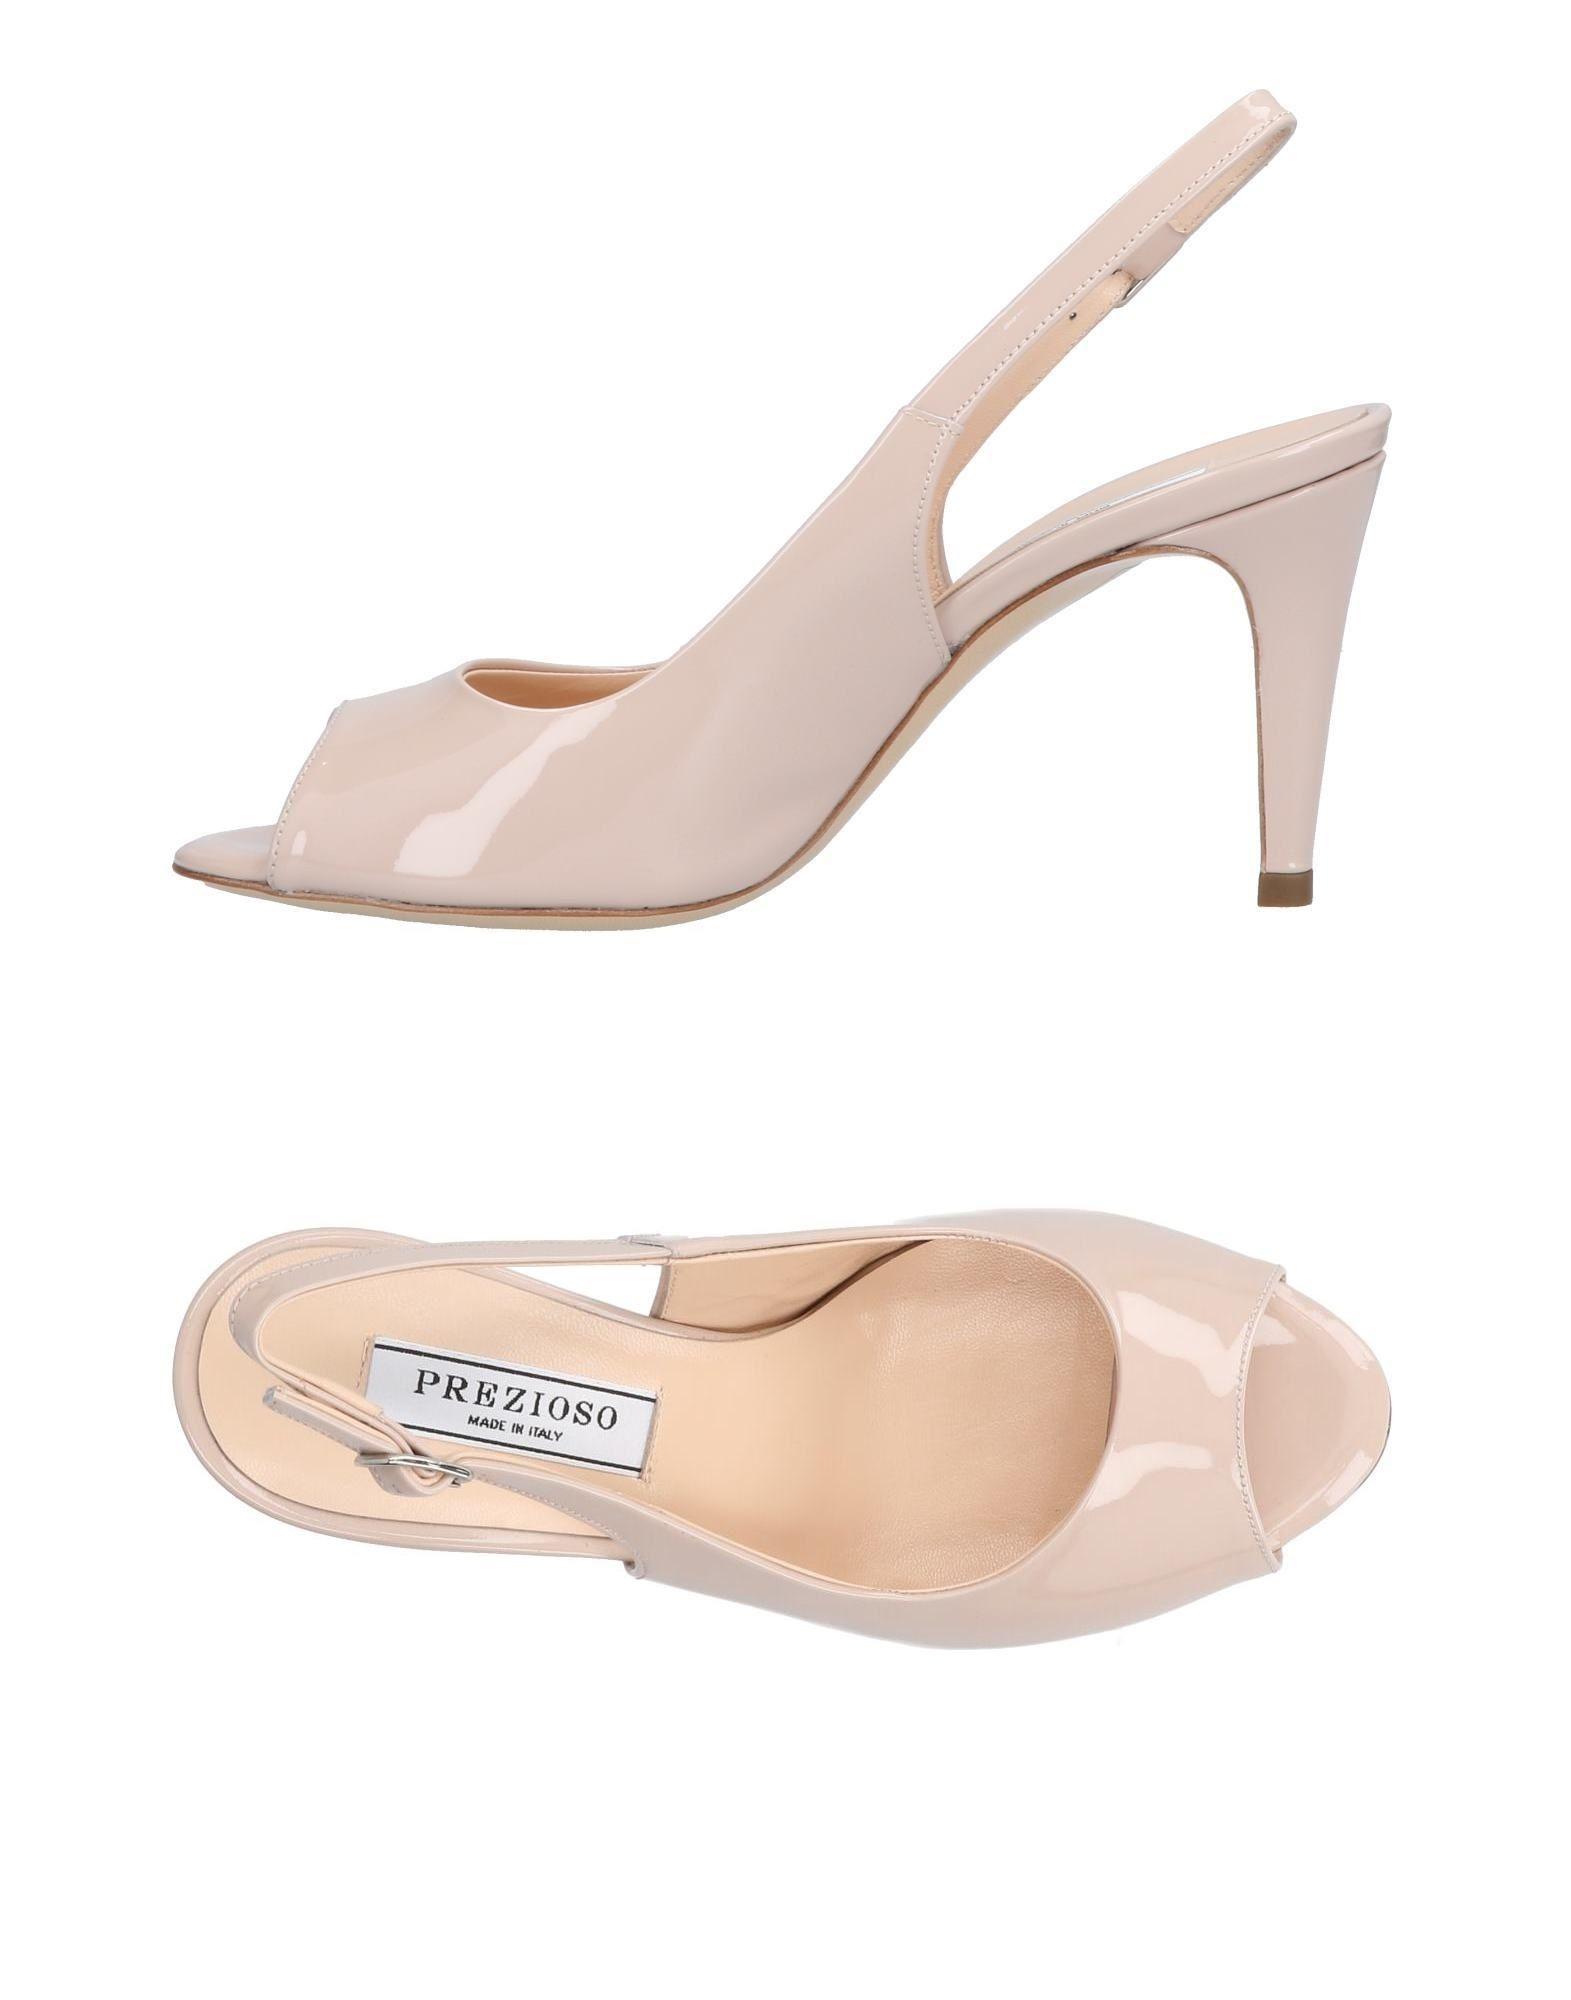 Moda Sandali Prezioso Donna - 11456140EN